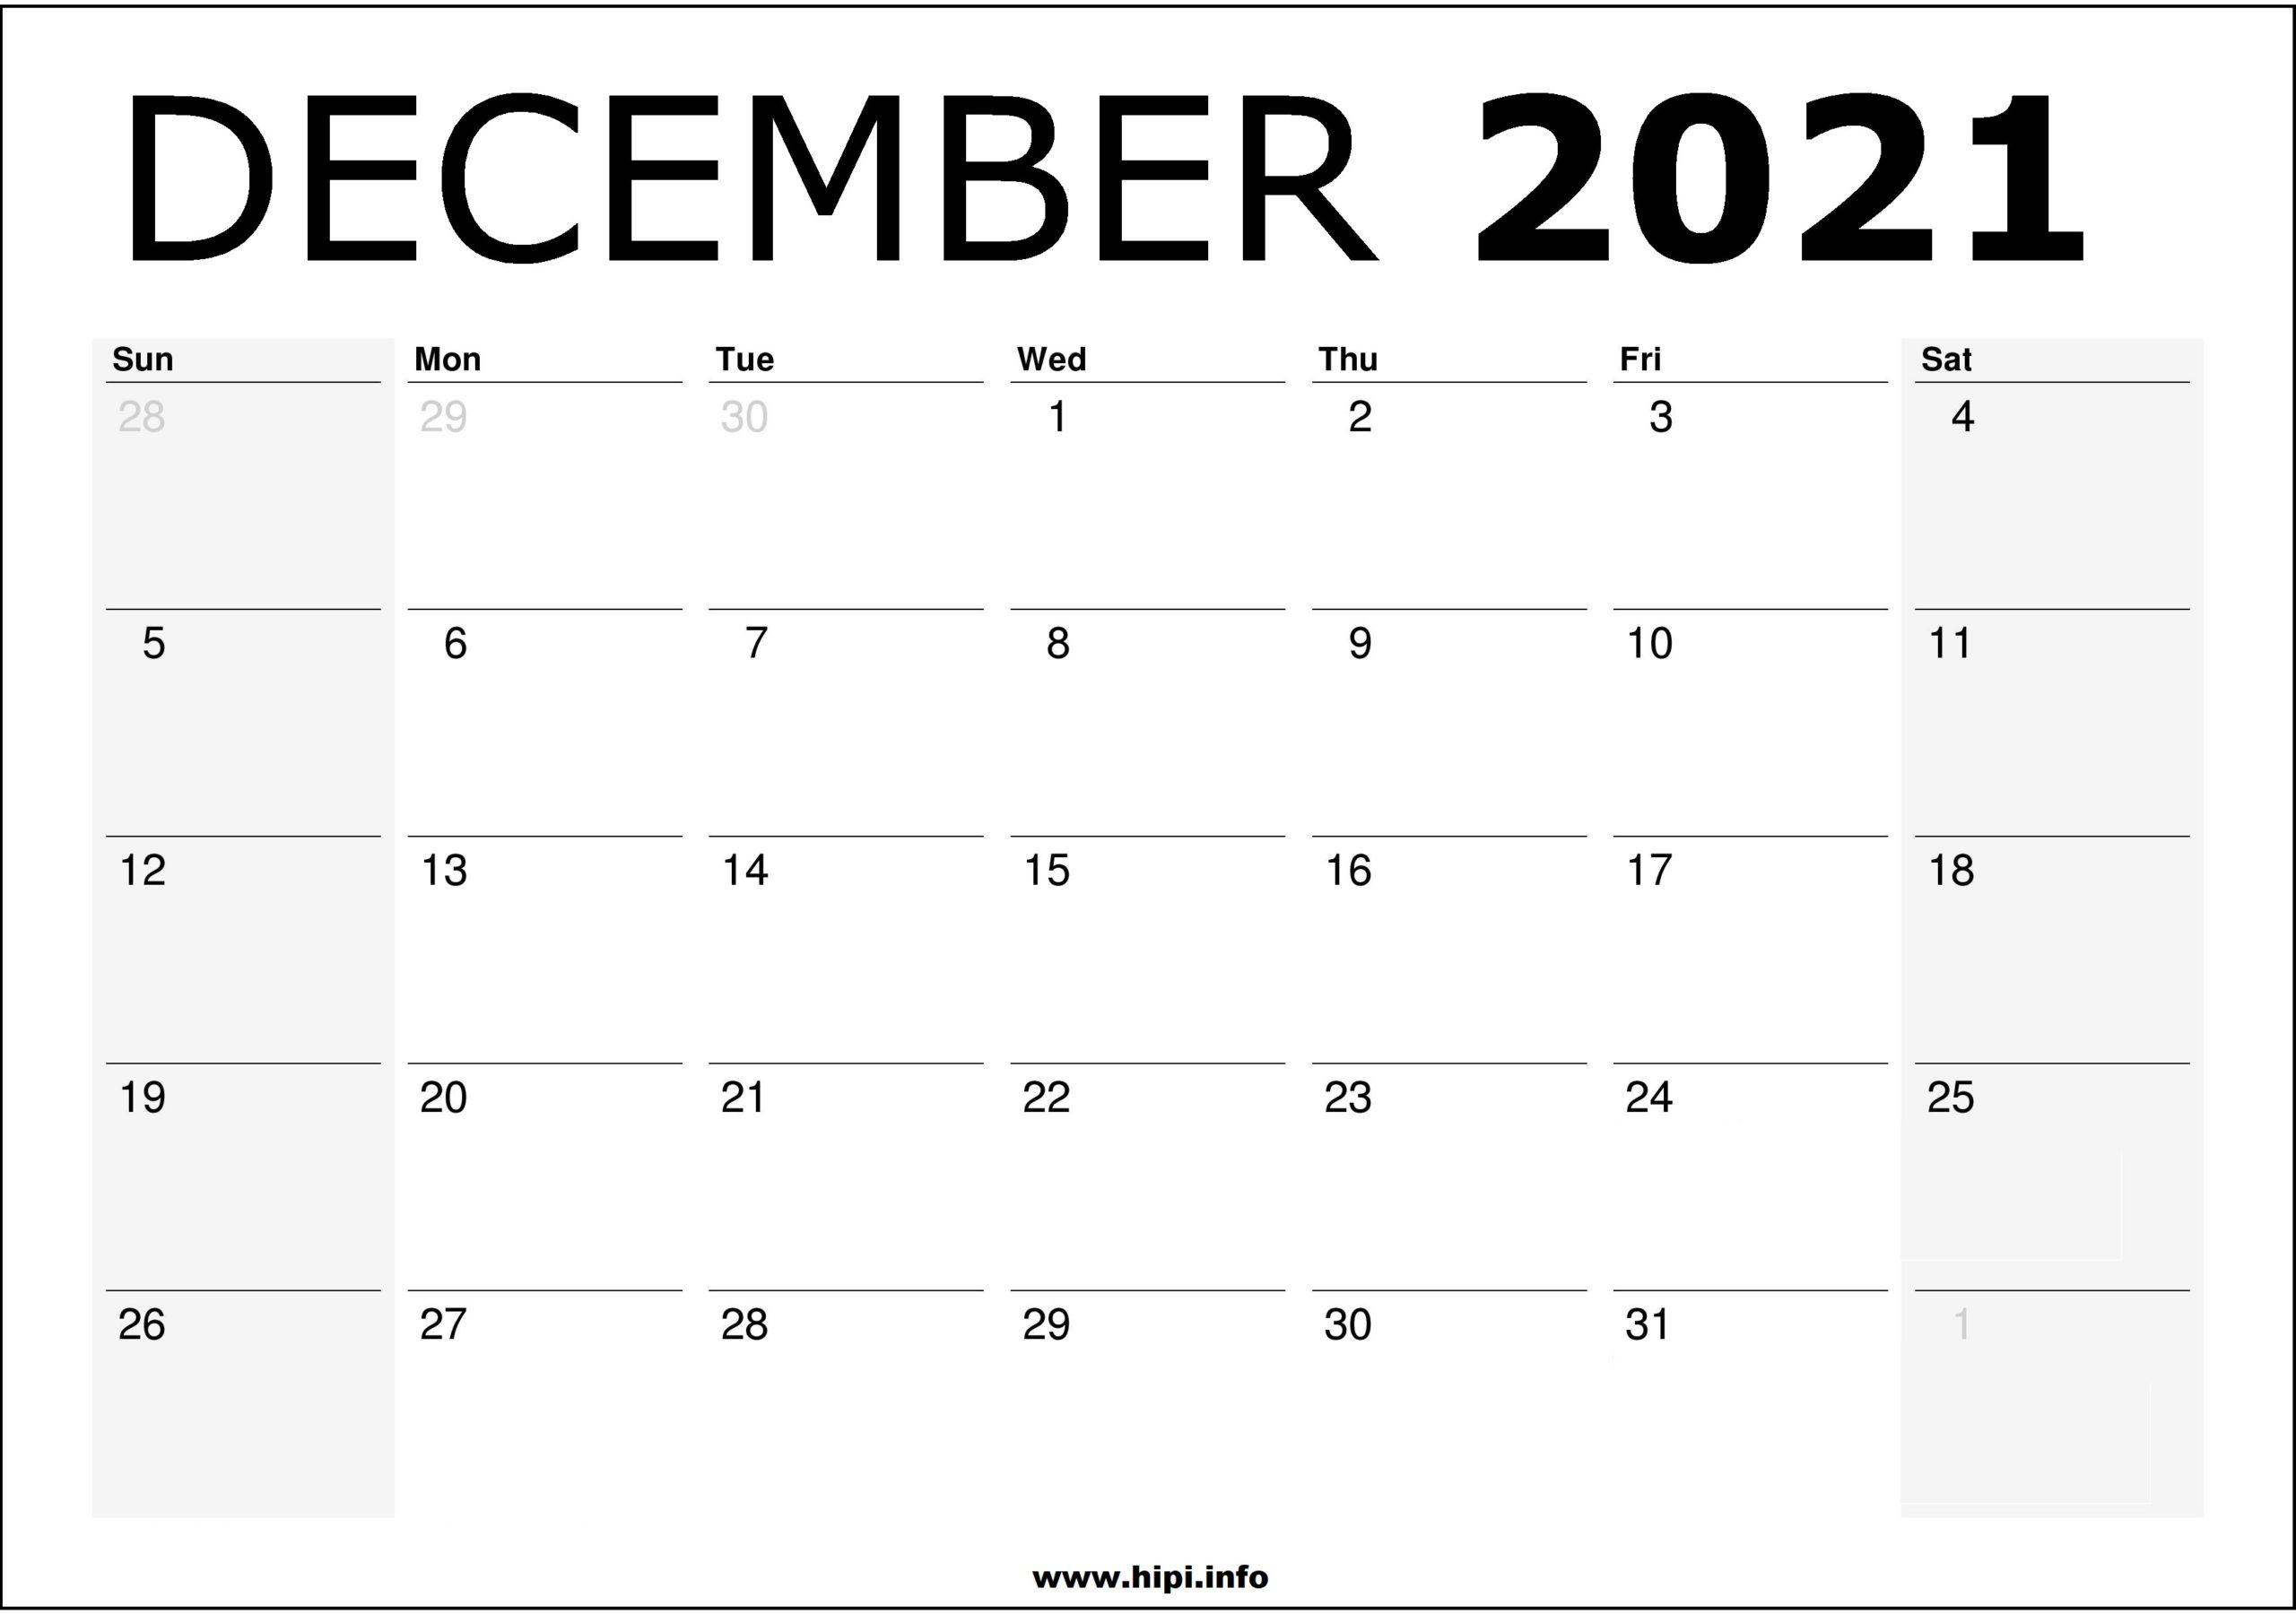 December 2021 Calendar Printable - Monthly Calendar Free ...